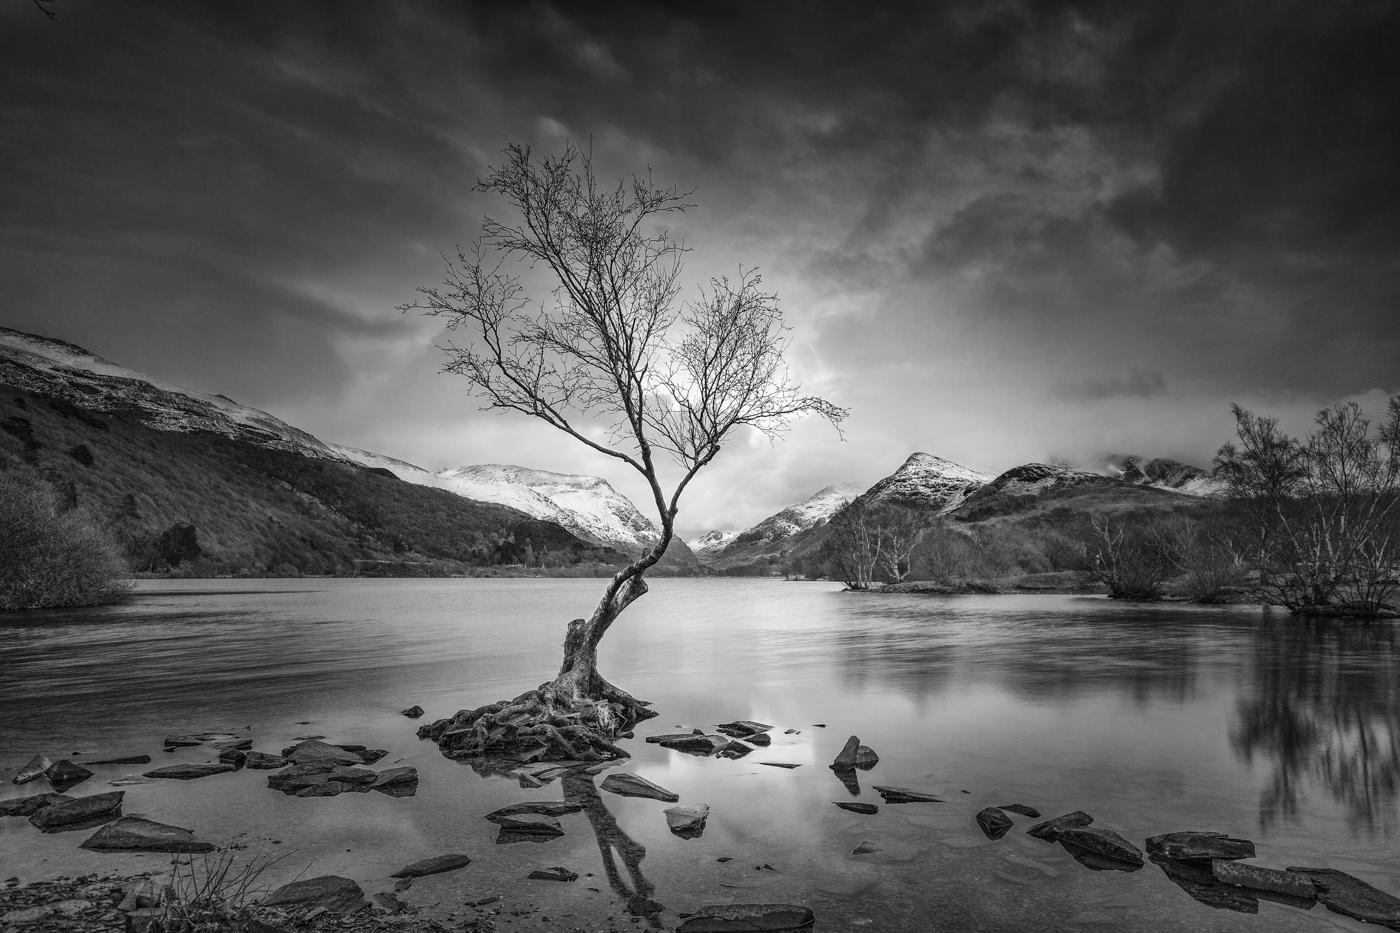 First 'Storm Brewing Over Llanberis Lake' by John Barton